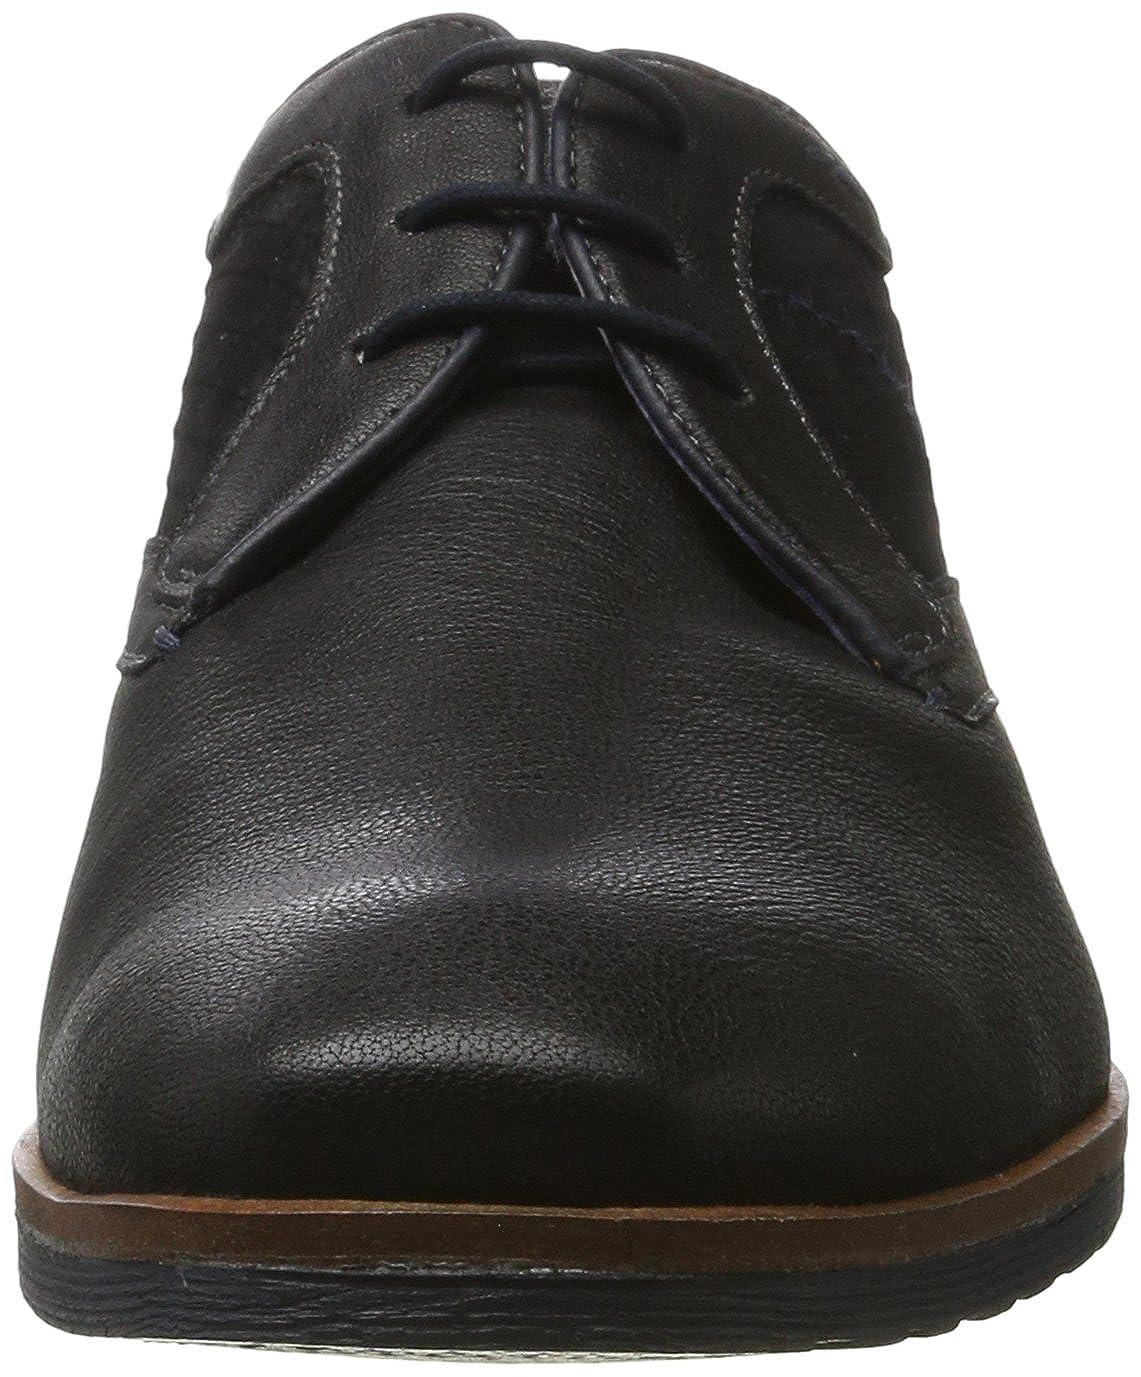 311374014030-1010 Bugatti Men Lace-Up Shoes Black, Black//Black